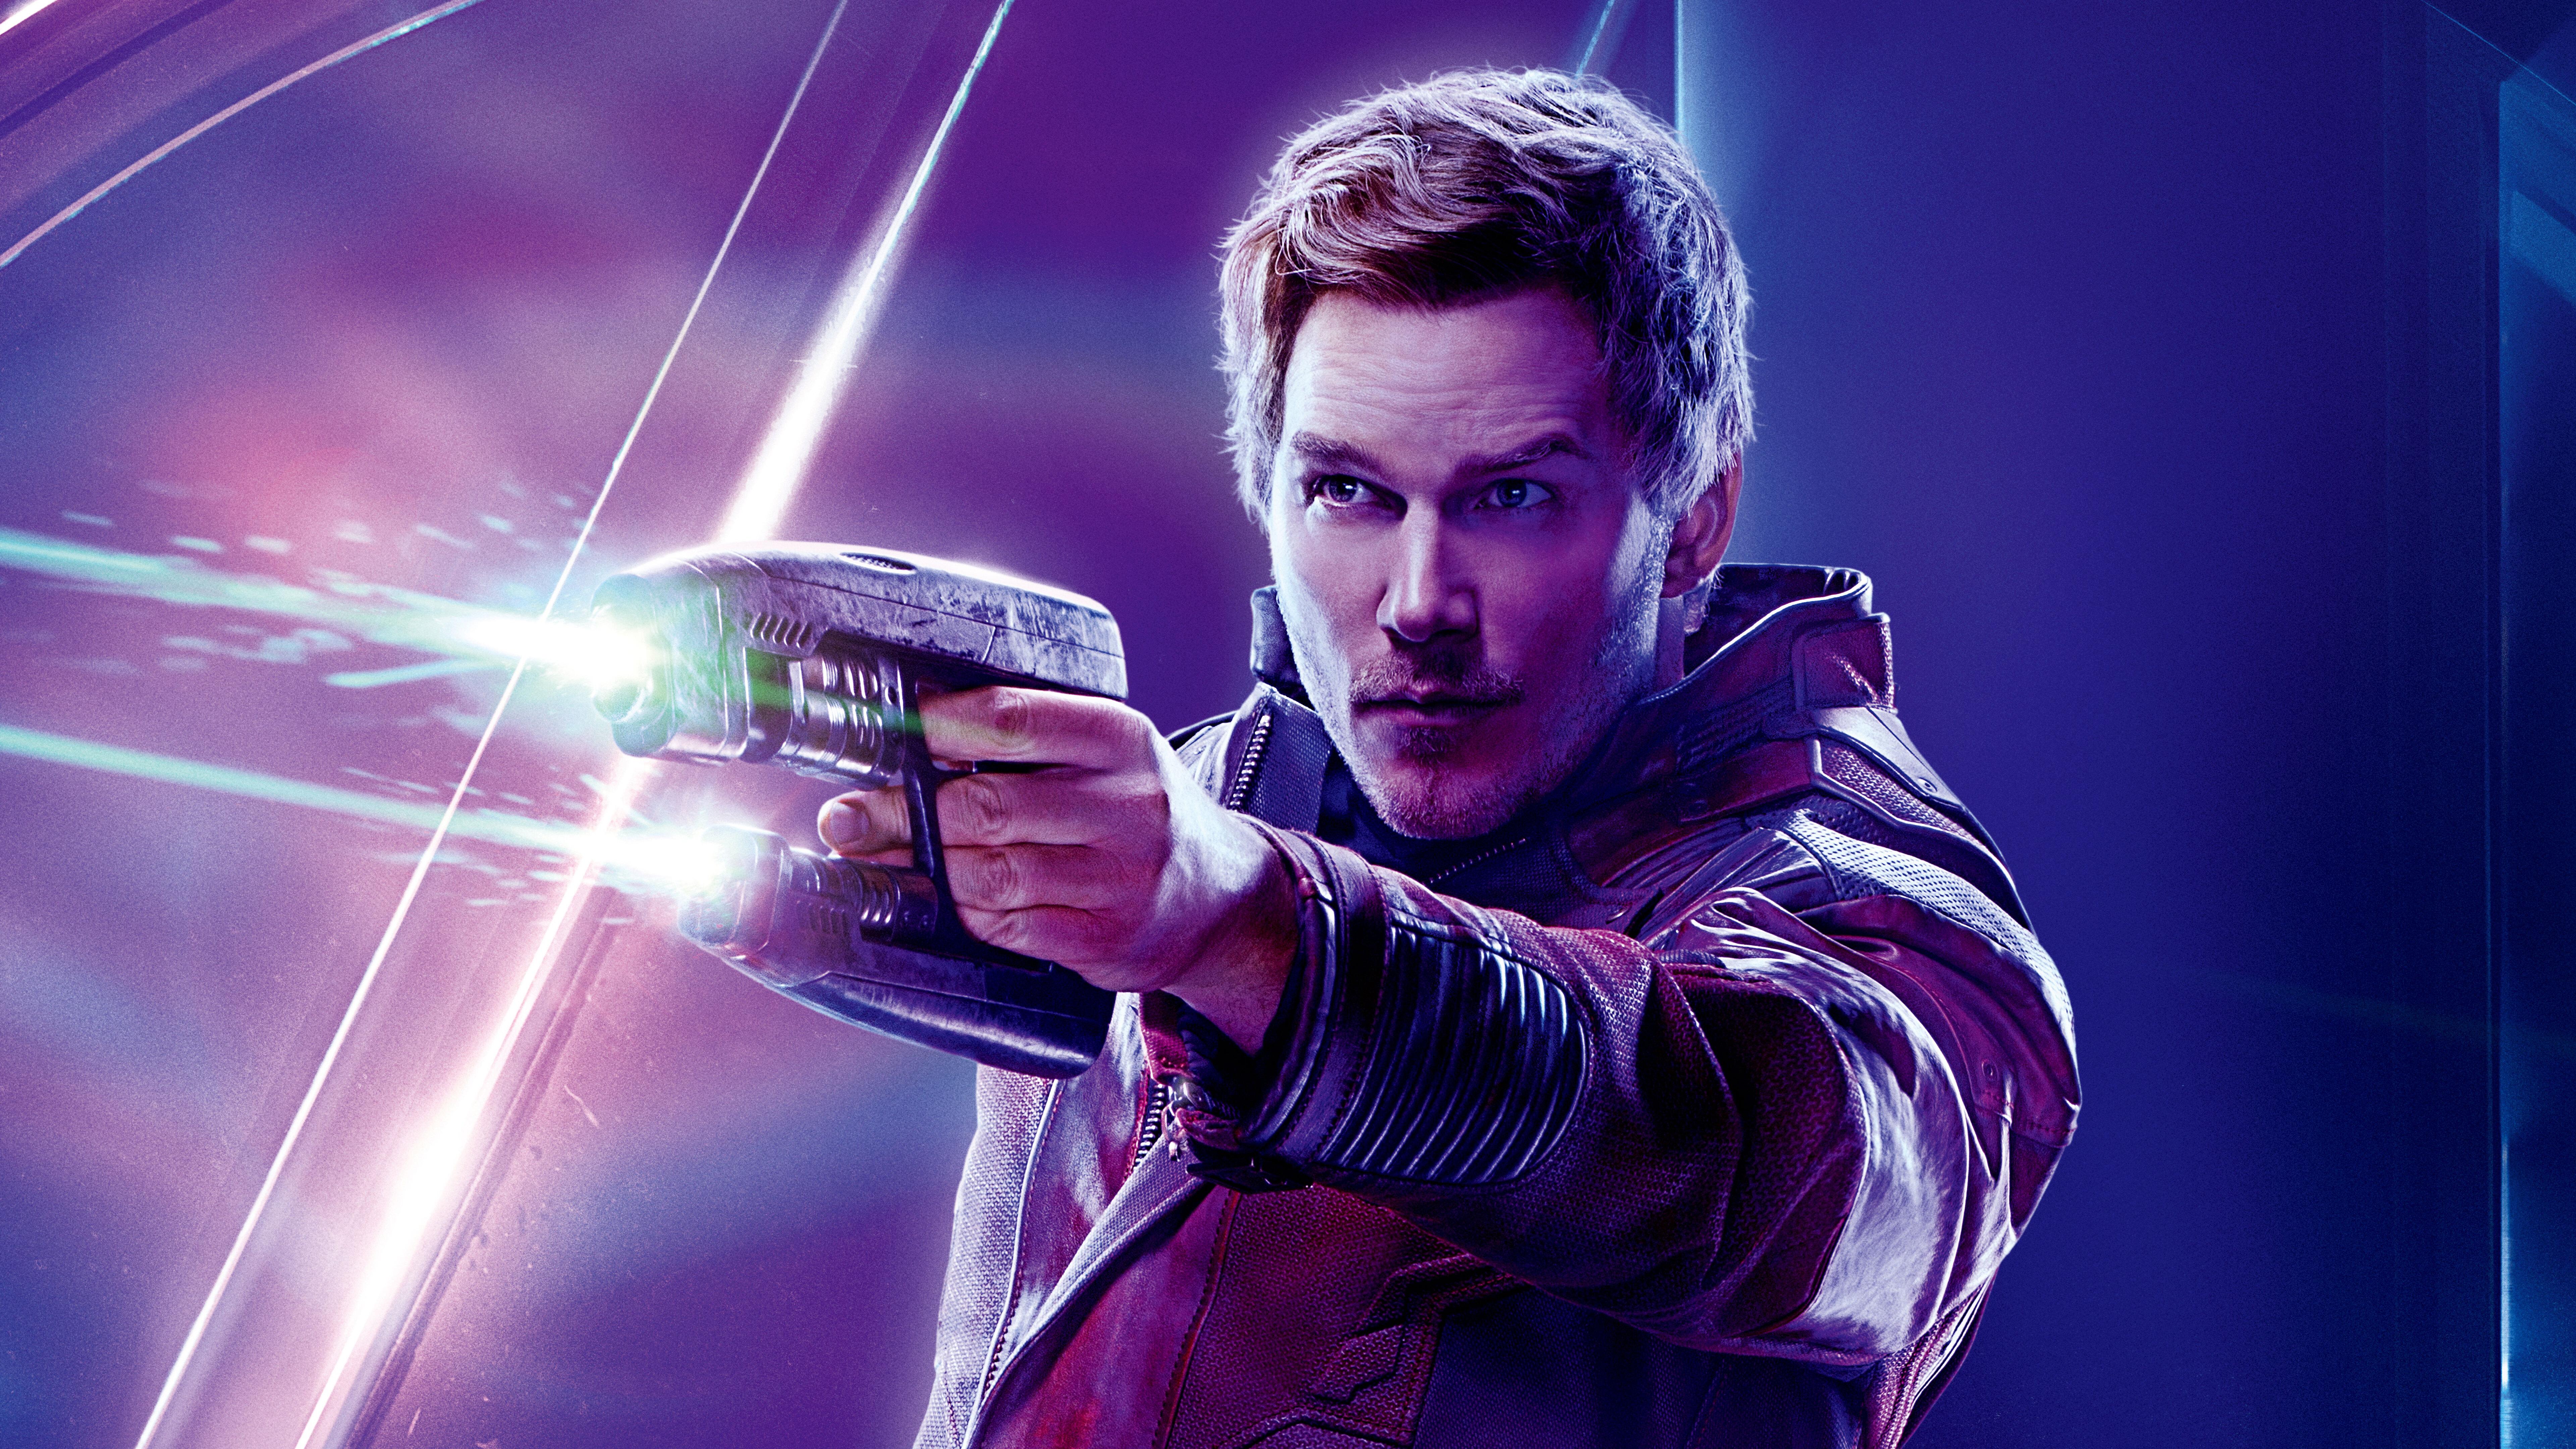 star-lord-in-avengers-infinity-war-8k-poster-jt.jpg